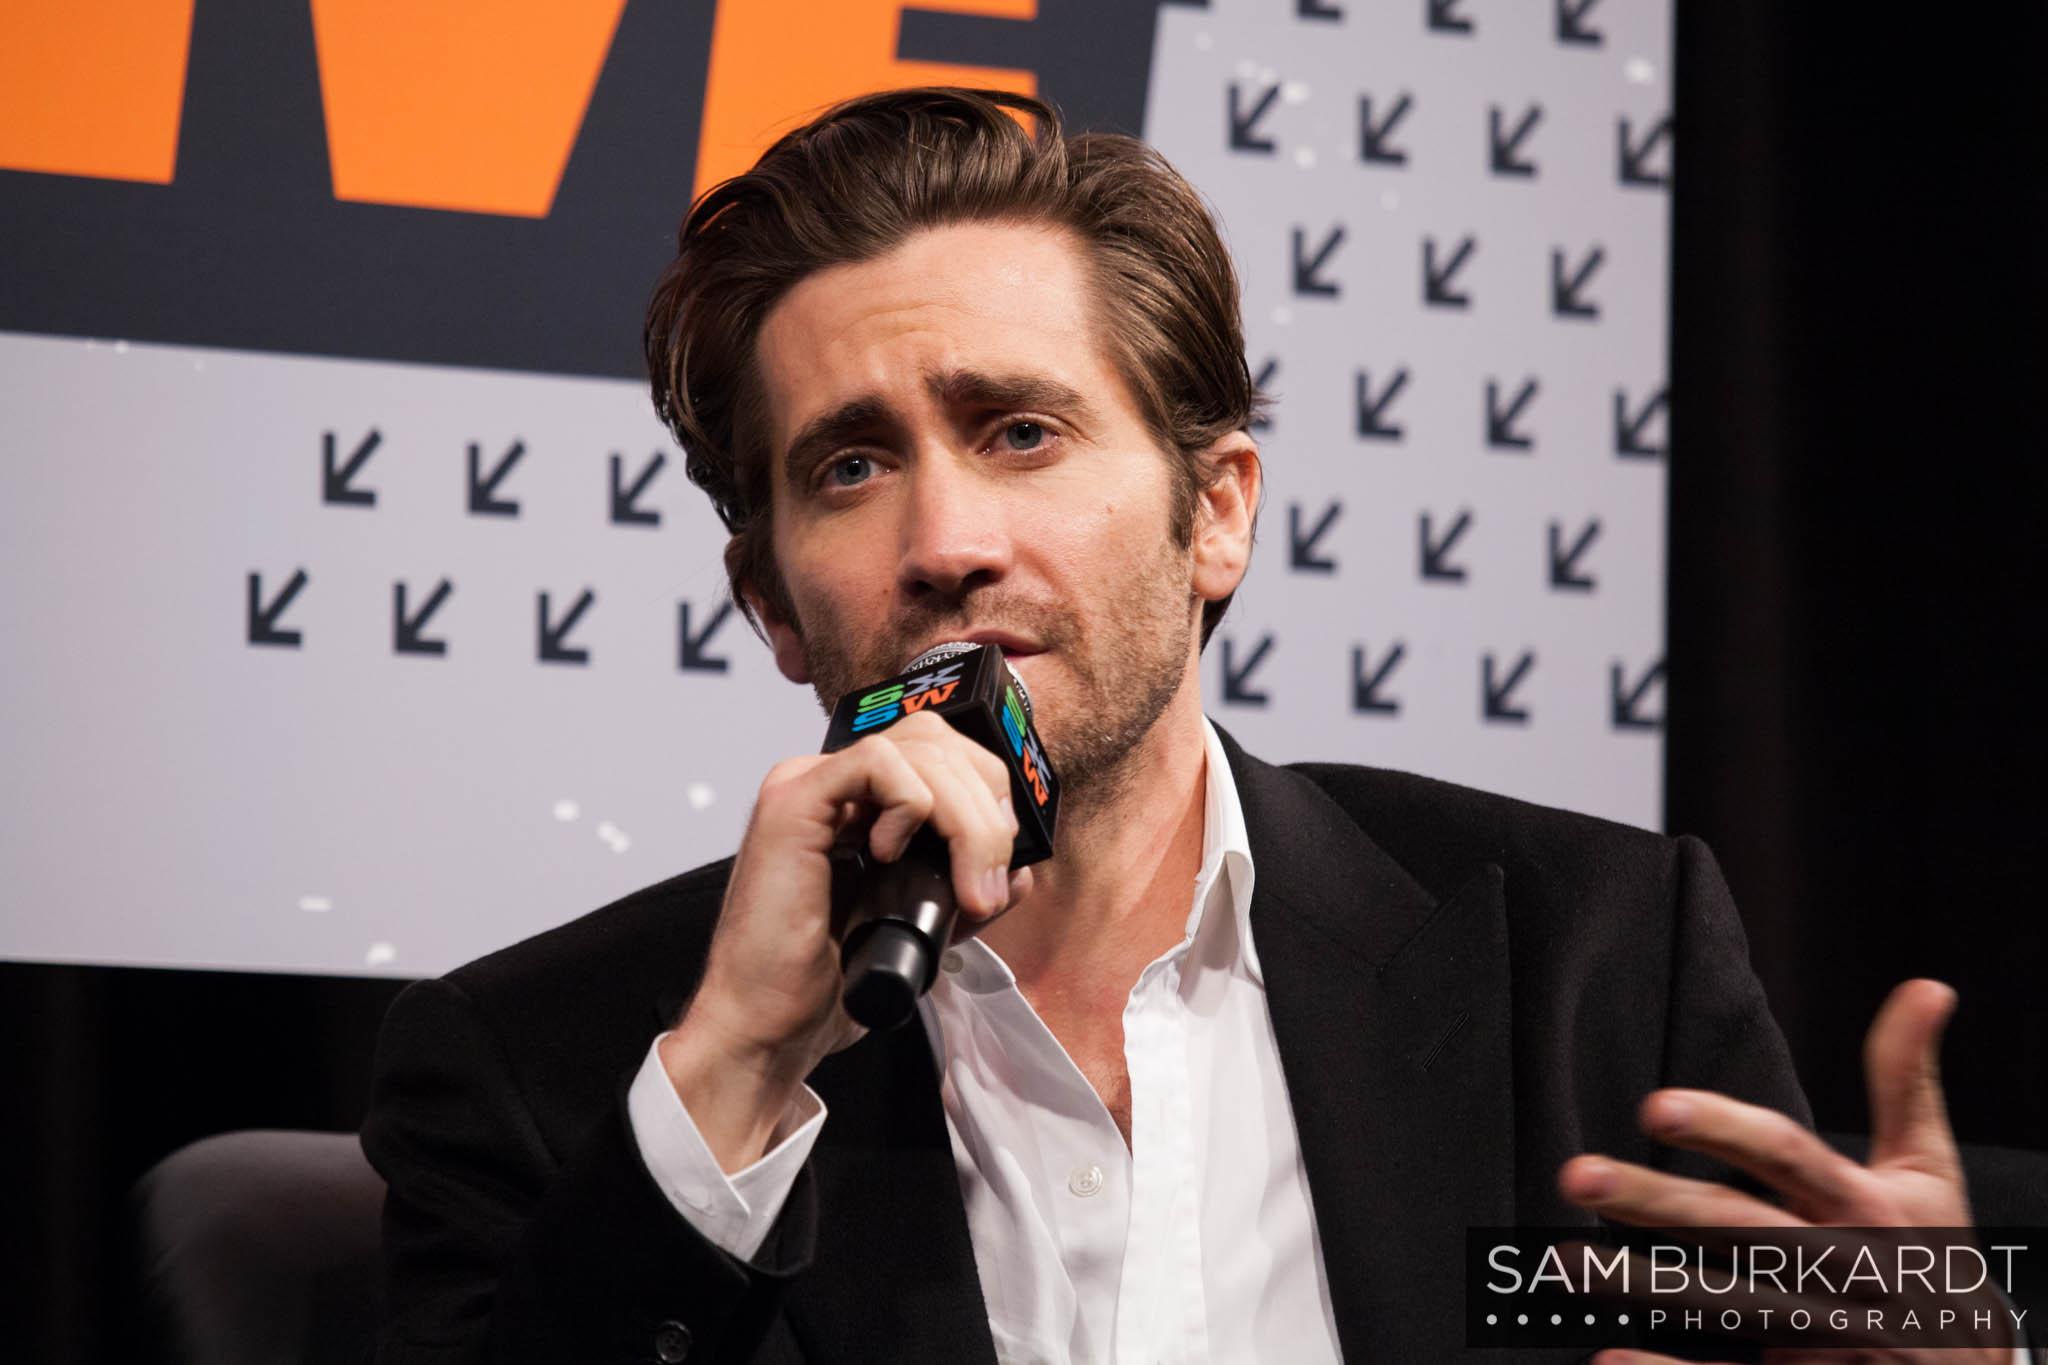 Jake Gyllenhaal at SXSW 2016 for Demolition interview